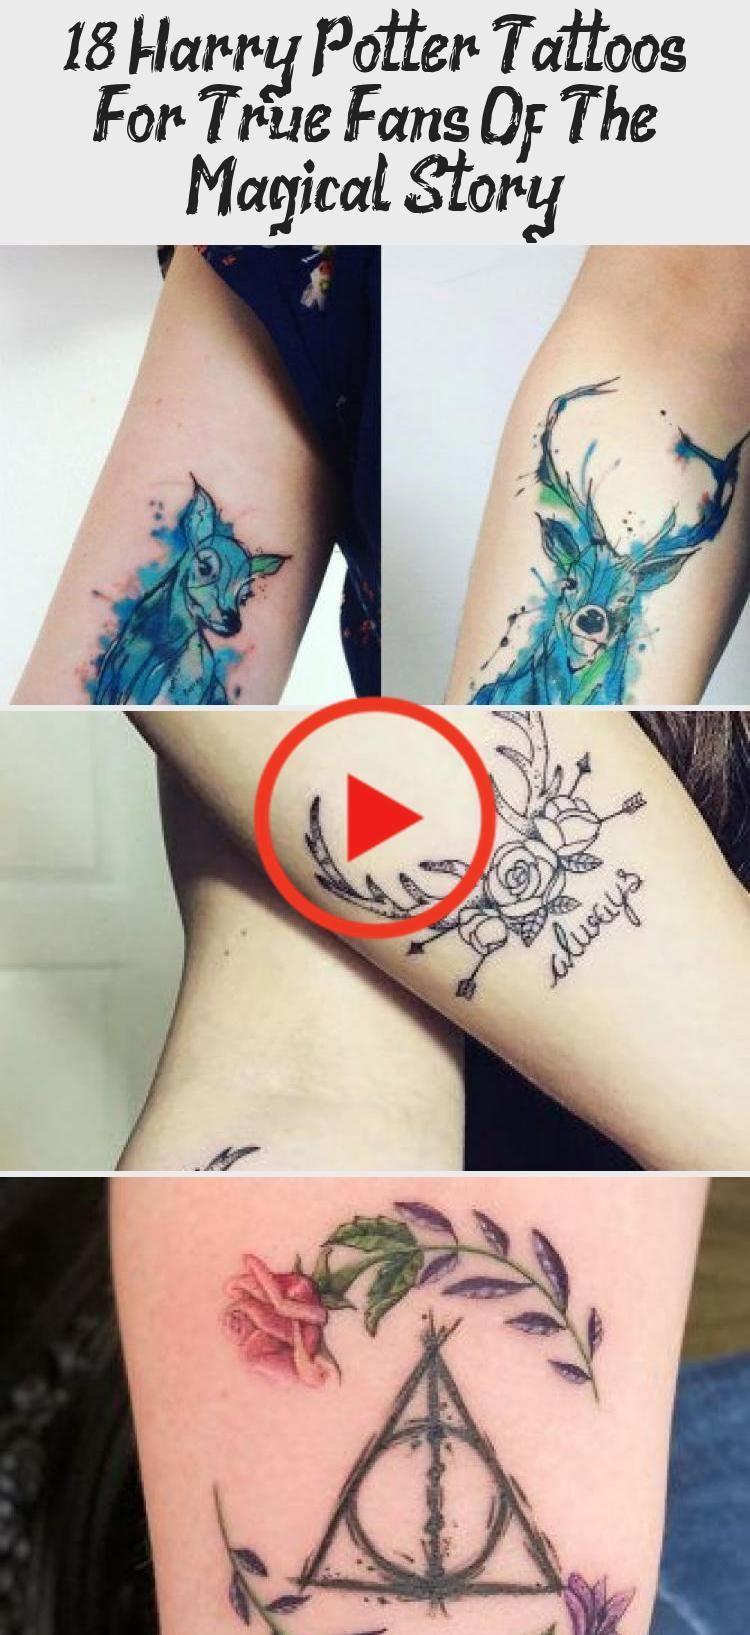 Harry Potter Couple Tattoos Coupletattoo Tattooforcouple Uniek Klein Of Harry Potter Co Harry Potter Tattoos Couple Tattoos Harry Potter Scar Tattoo